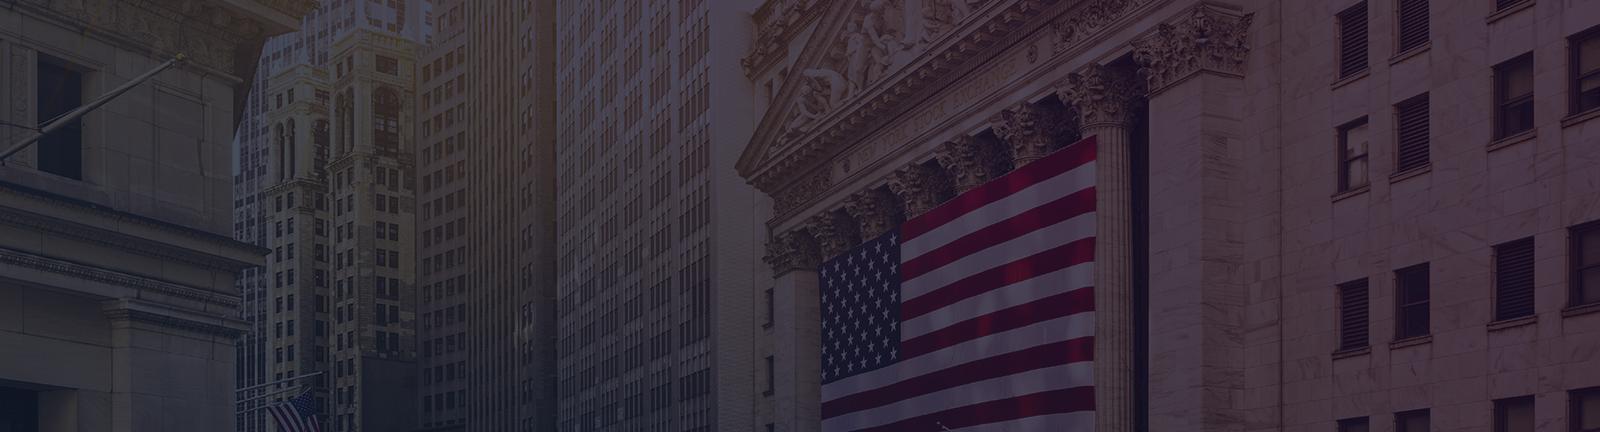 US IPO market gaining momentum